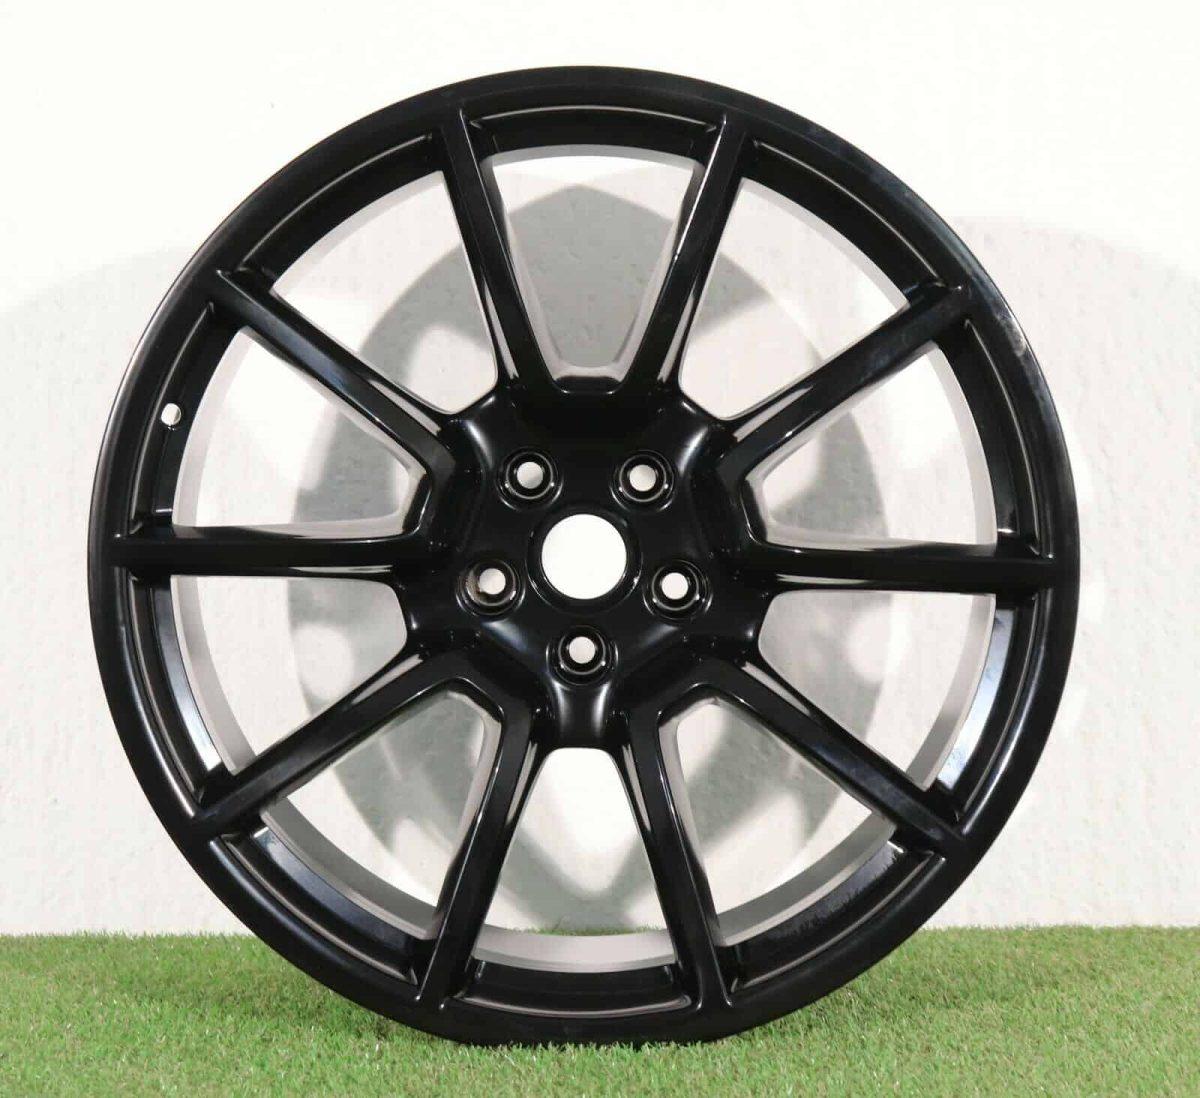 "Genuine Porsche Macan 95B Sport Design 20"" Inch Alloy Wheels with Gloss Black Finish 95B601025BH88Z 95B601025BJ88Z"